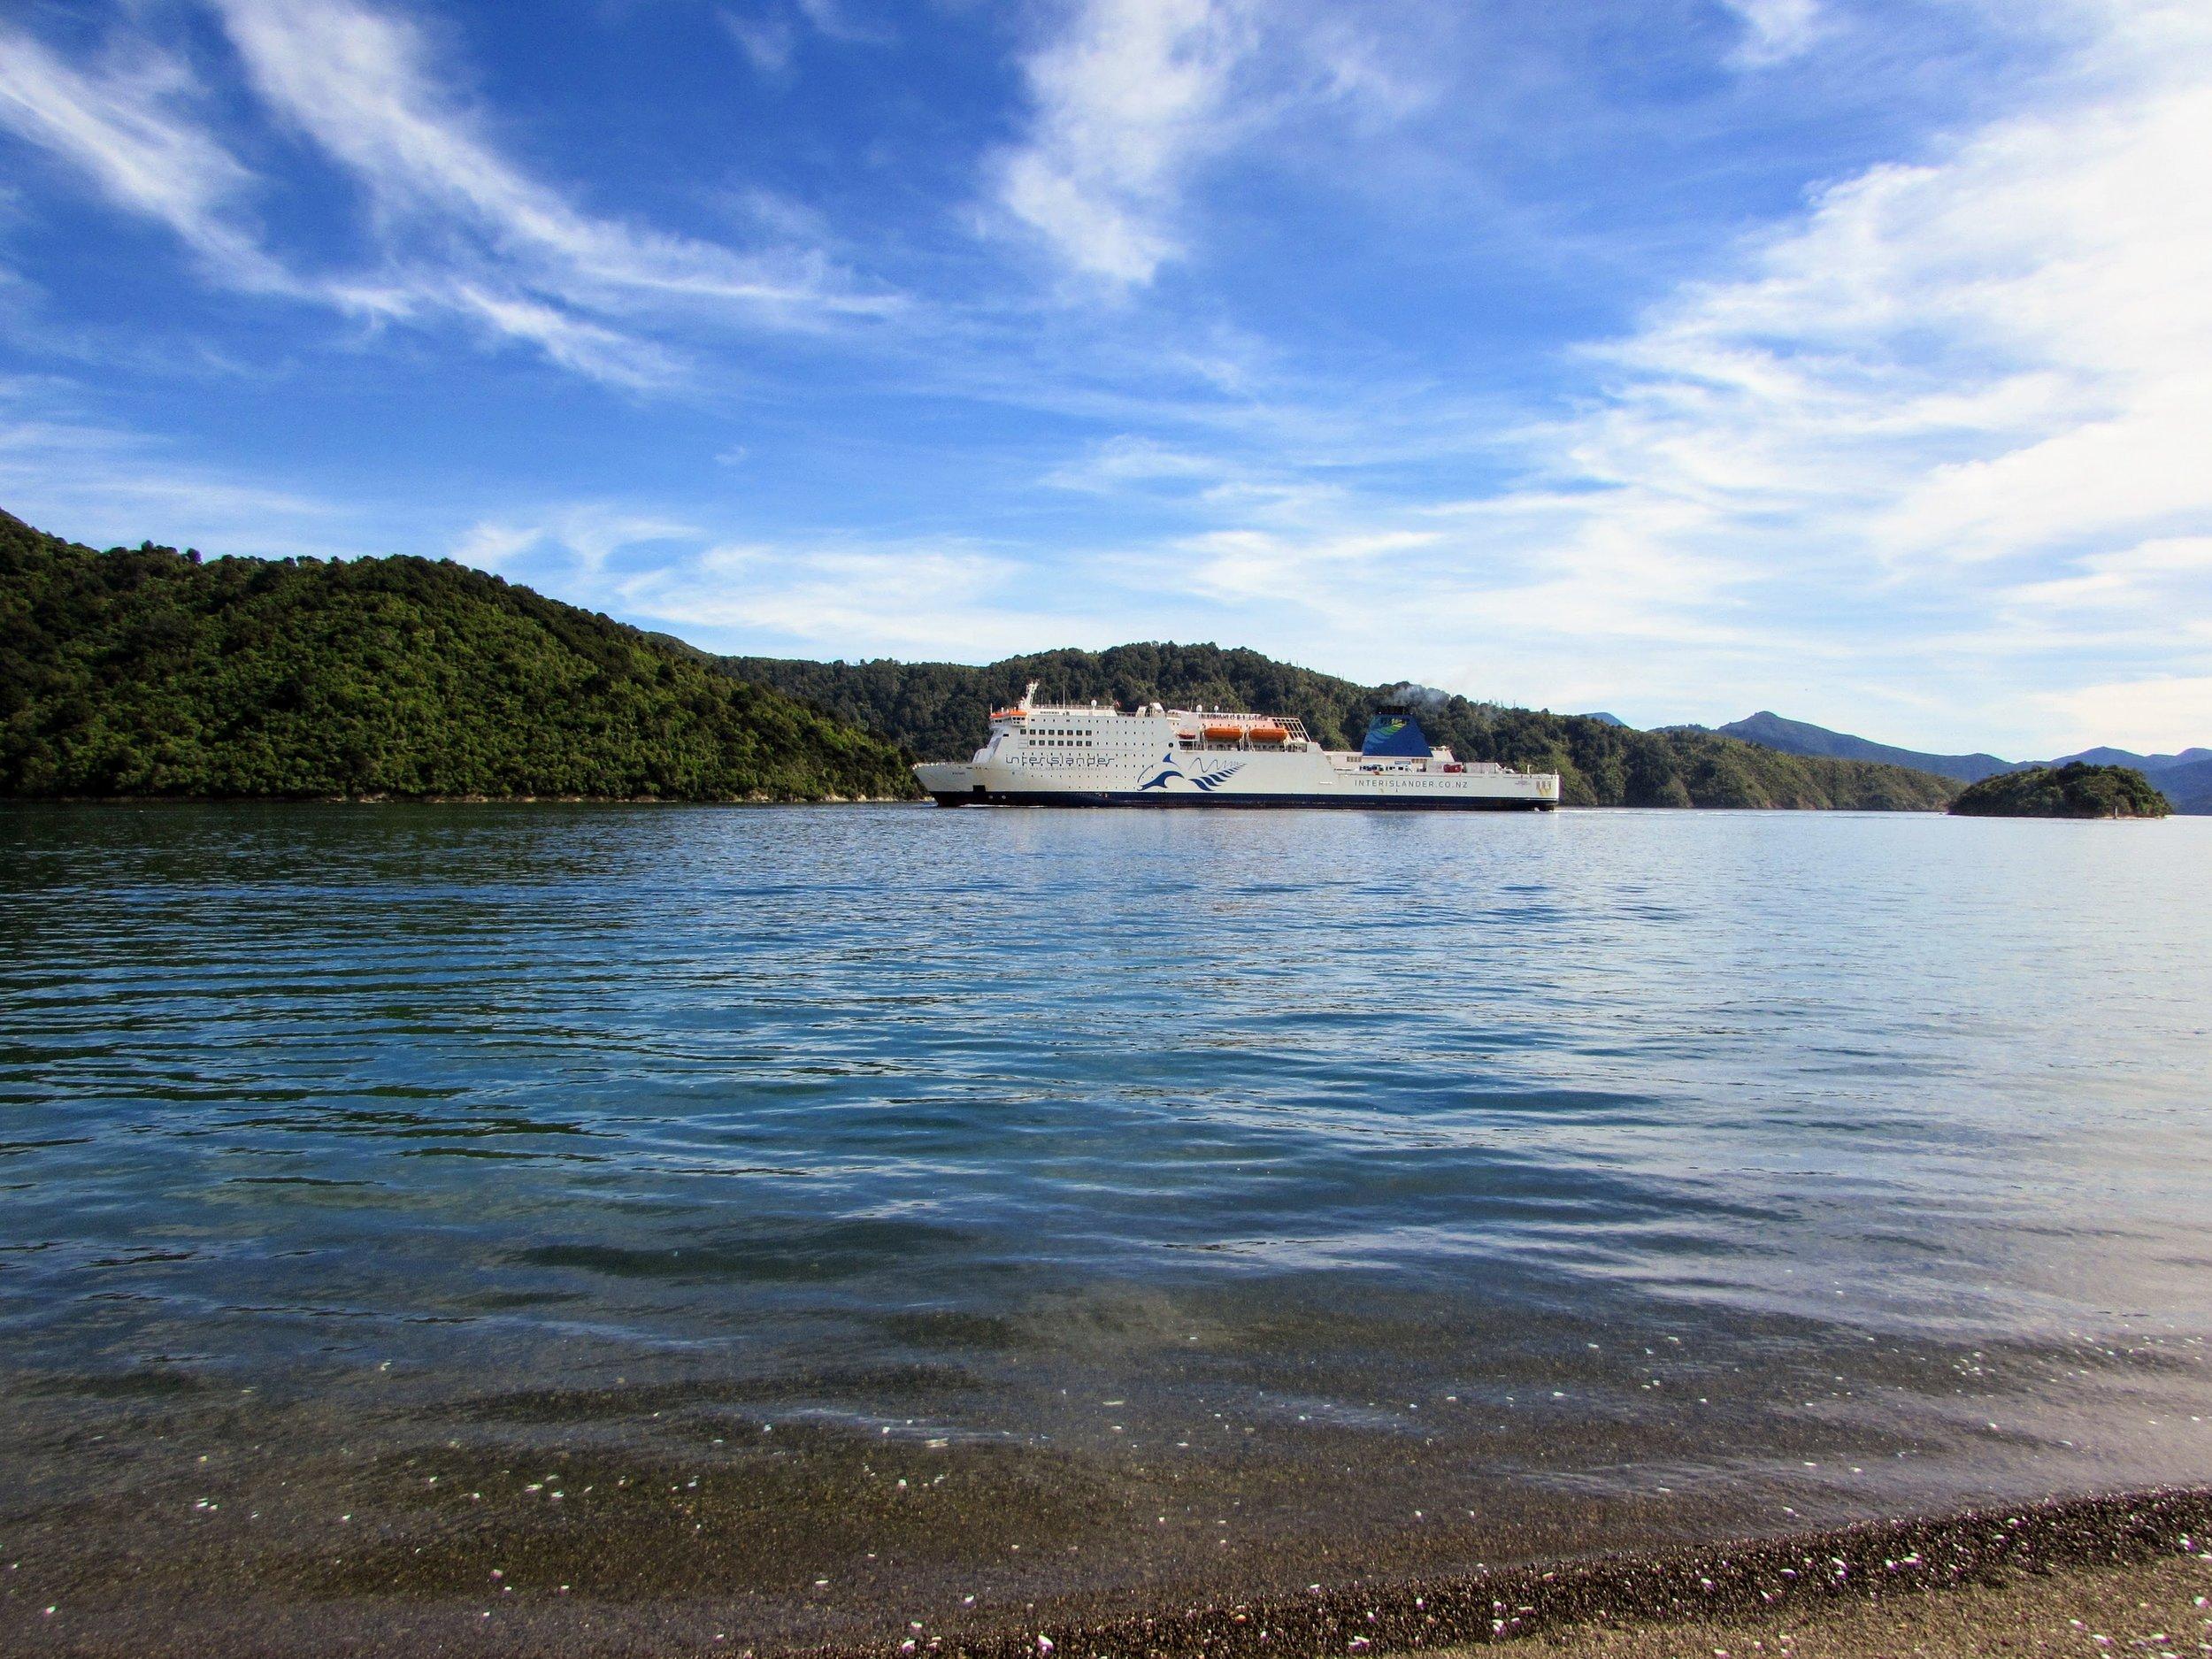 The Interislander ferry arriving in Picton, NZ.